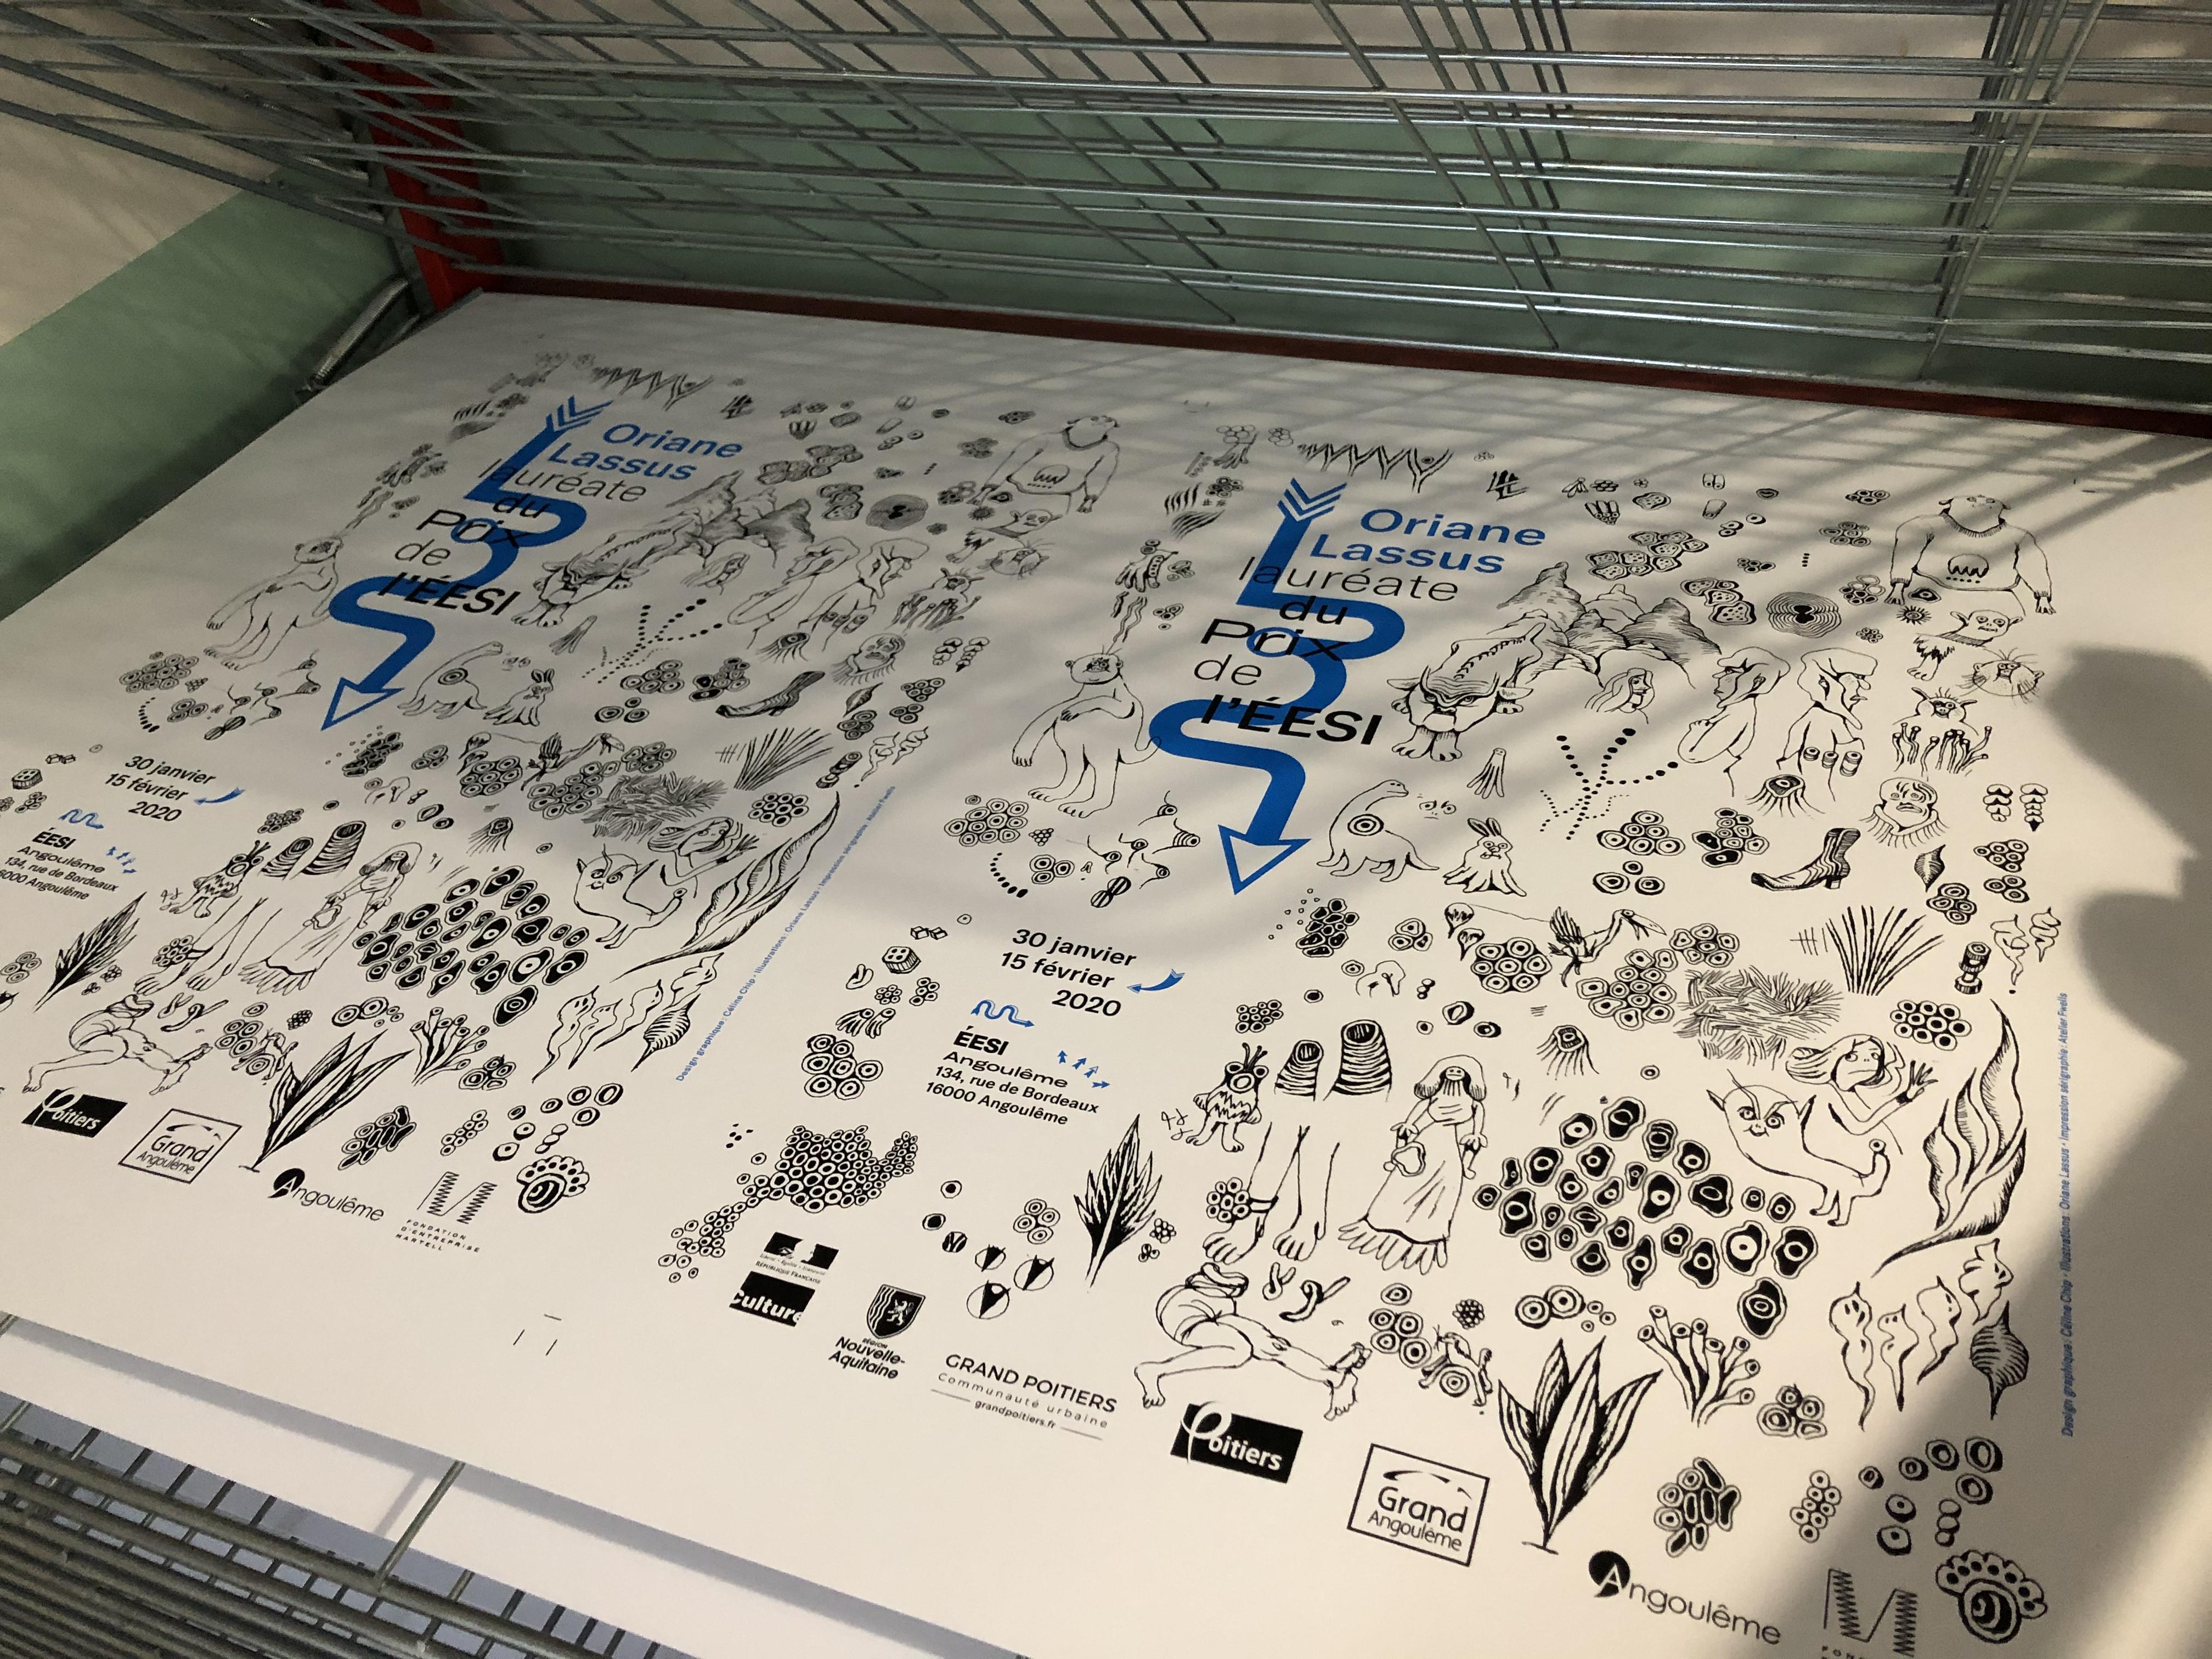 Orianne-lassus-serigraphie-poster-affche-serigraphie